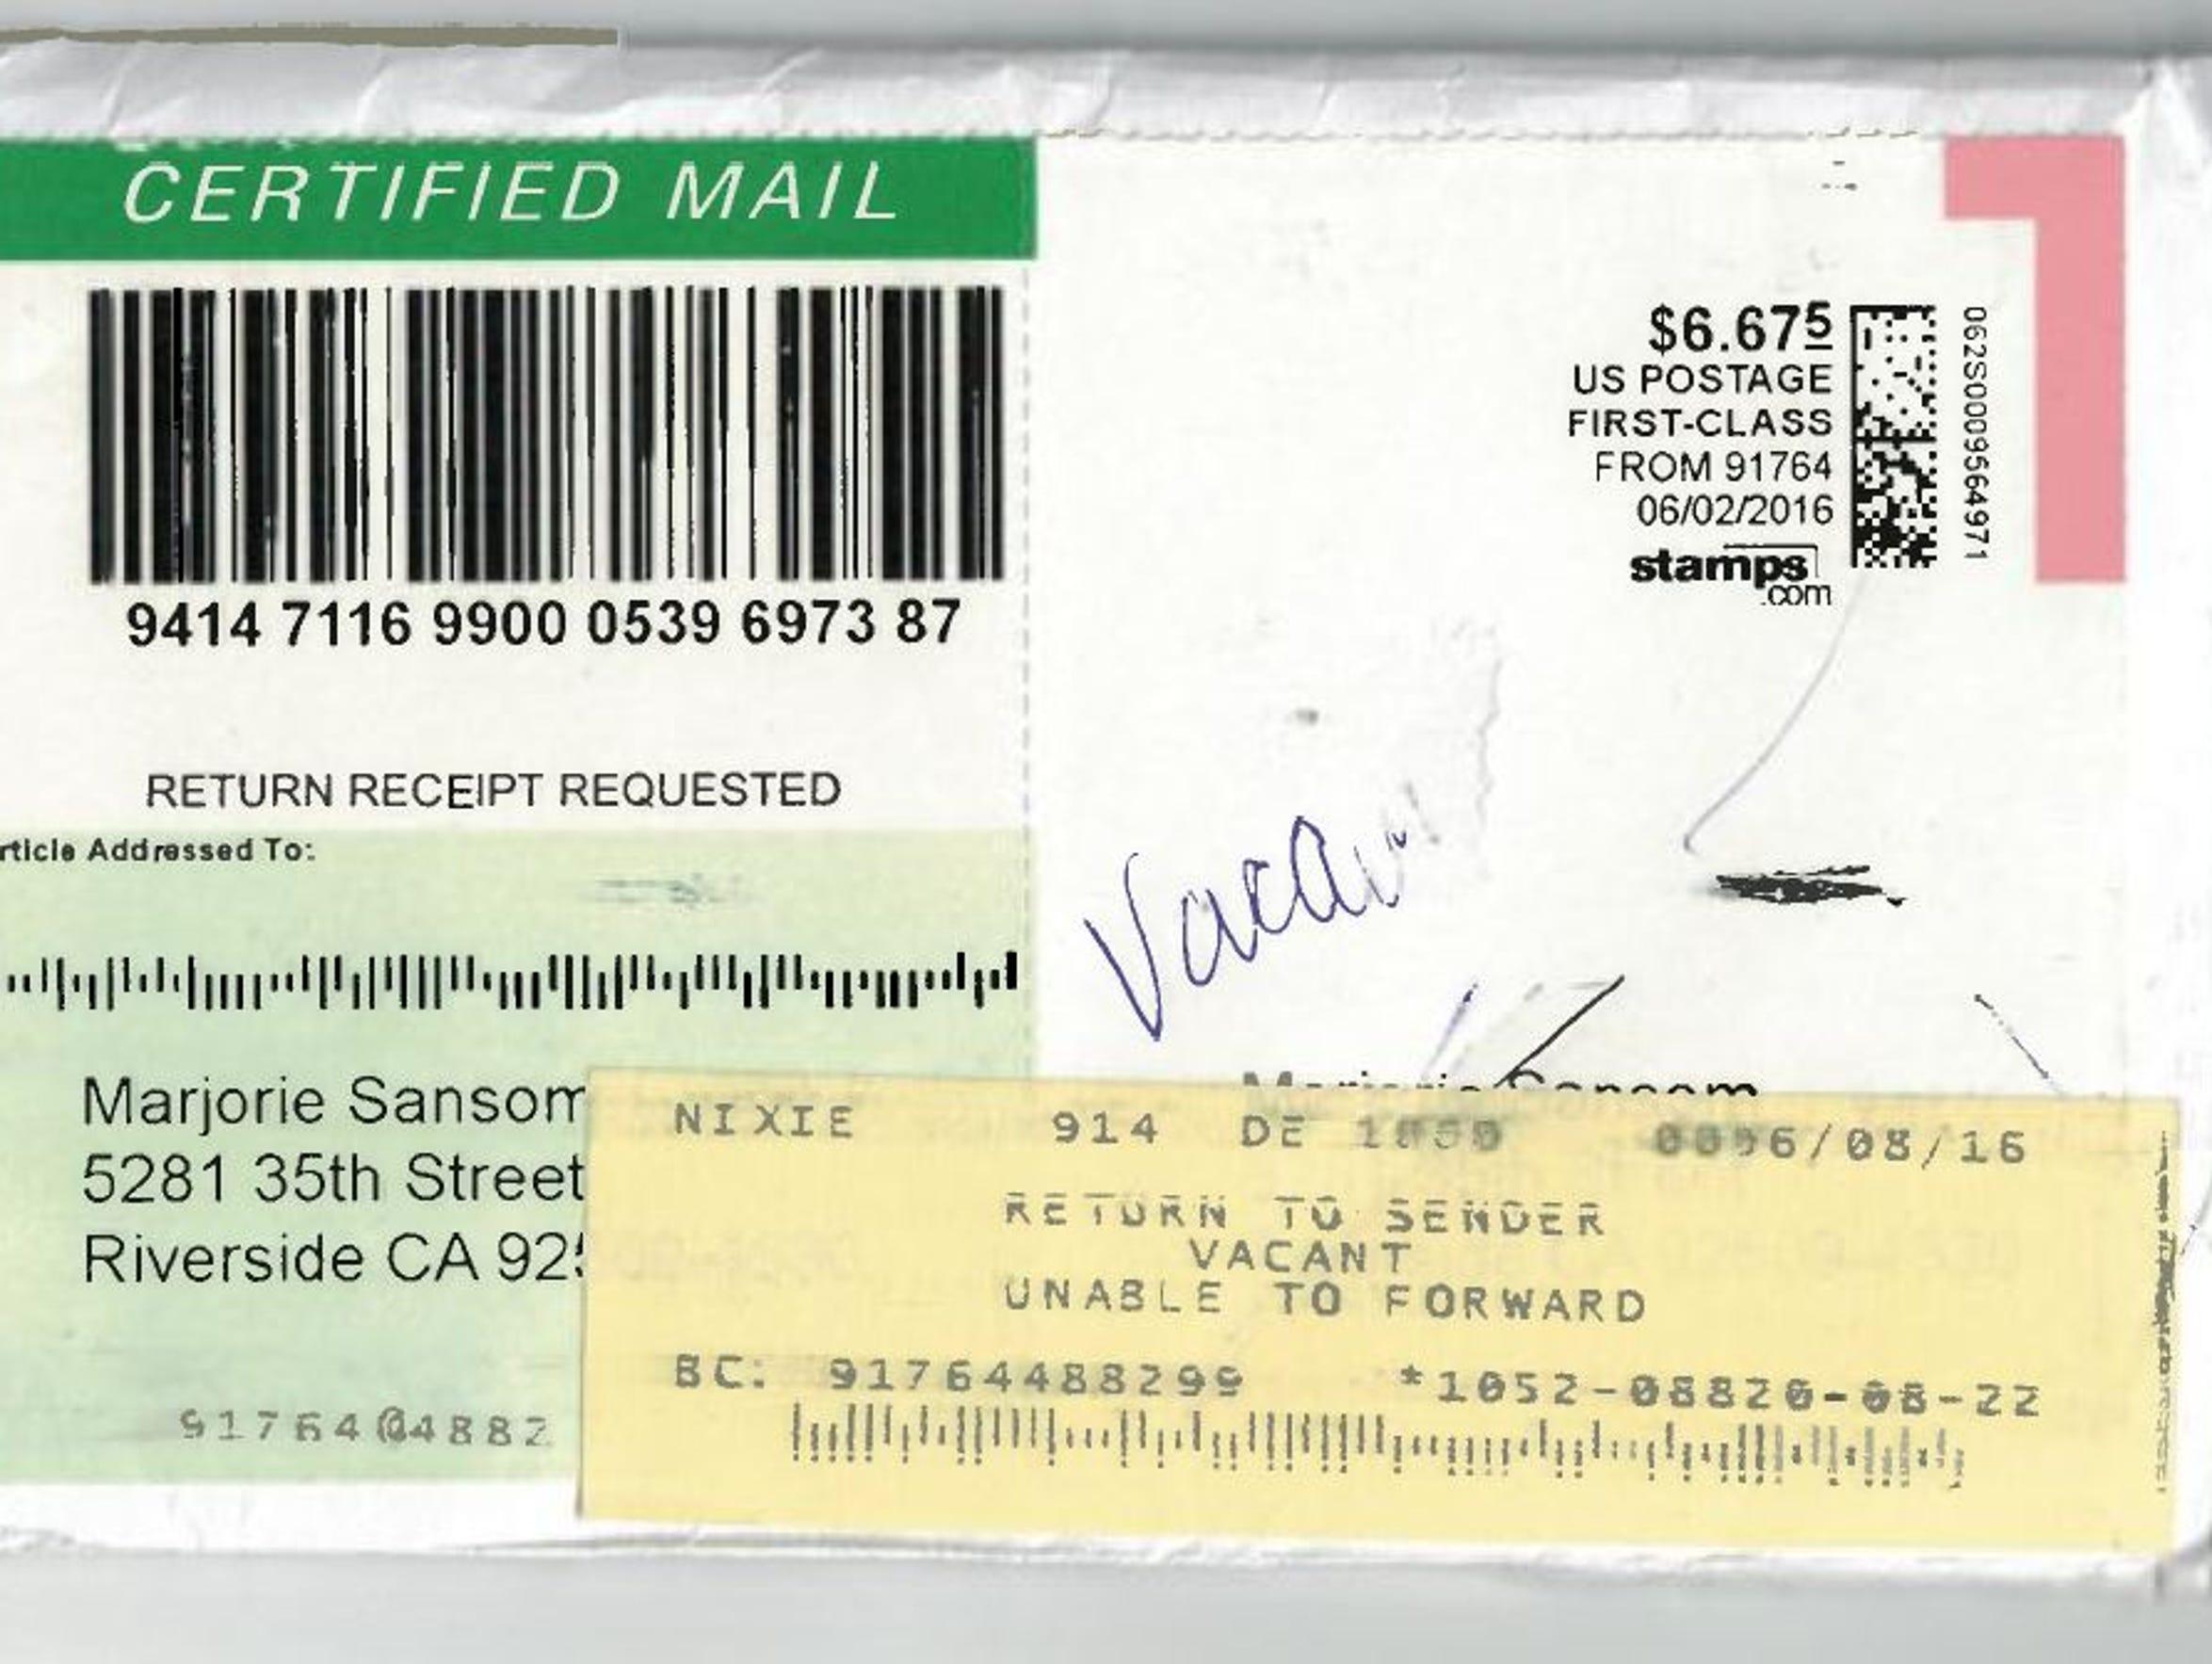 A screenshot of an envelope shows how Coachella's legal